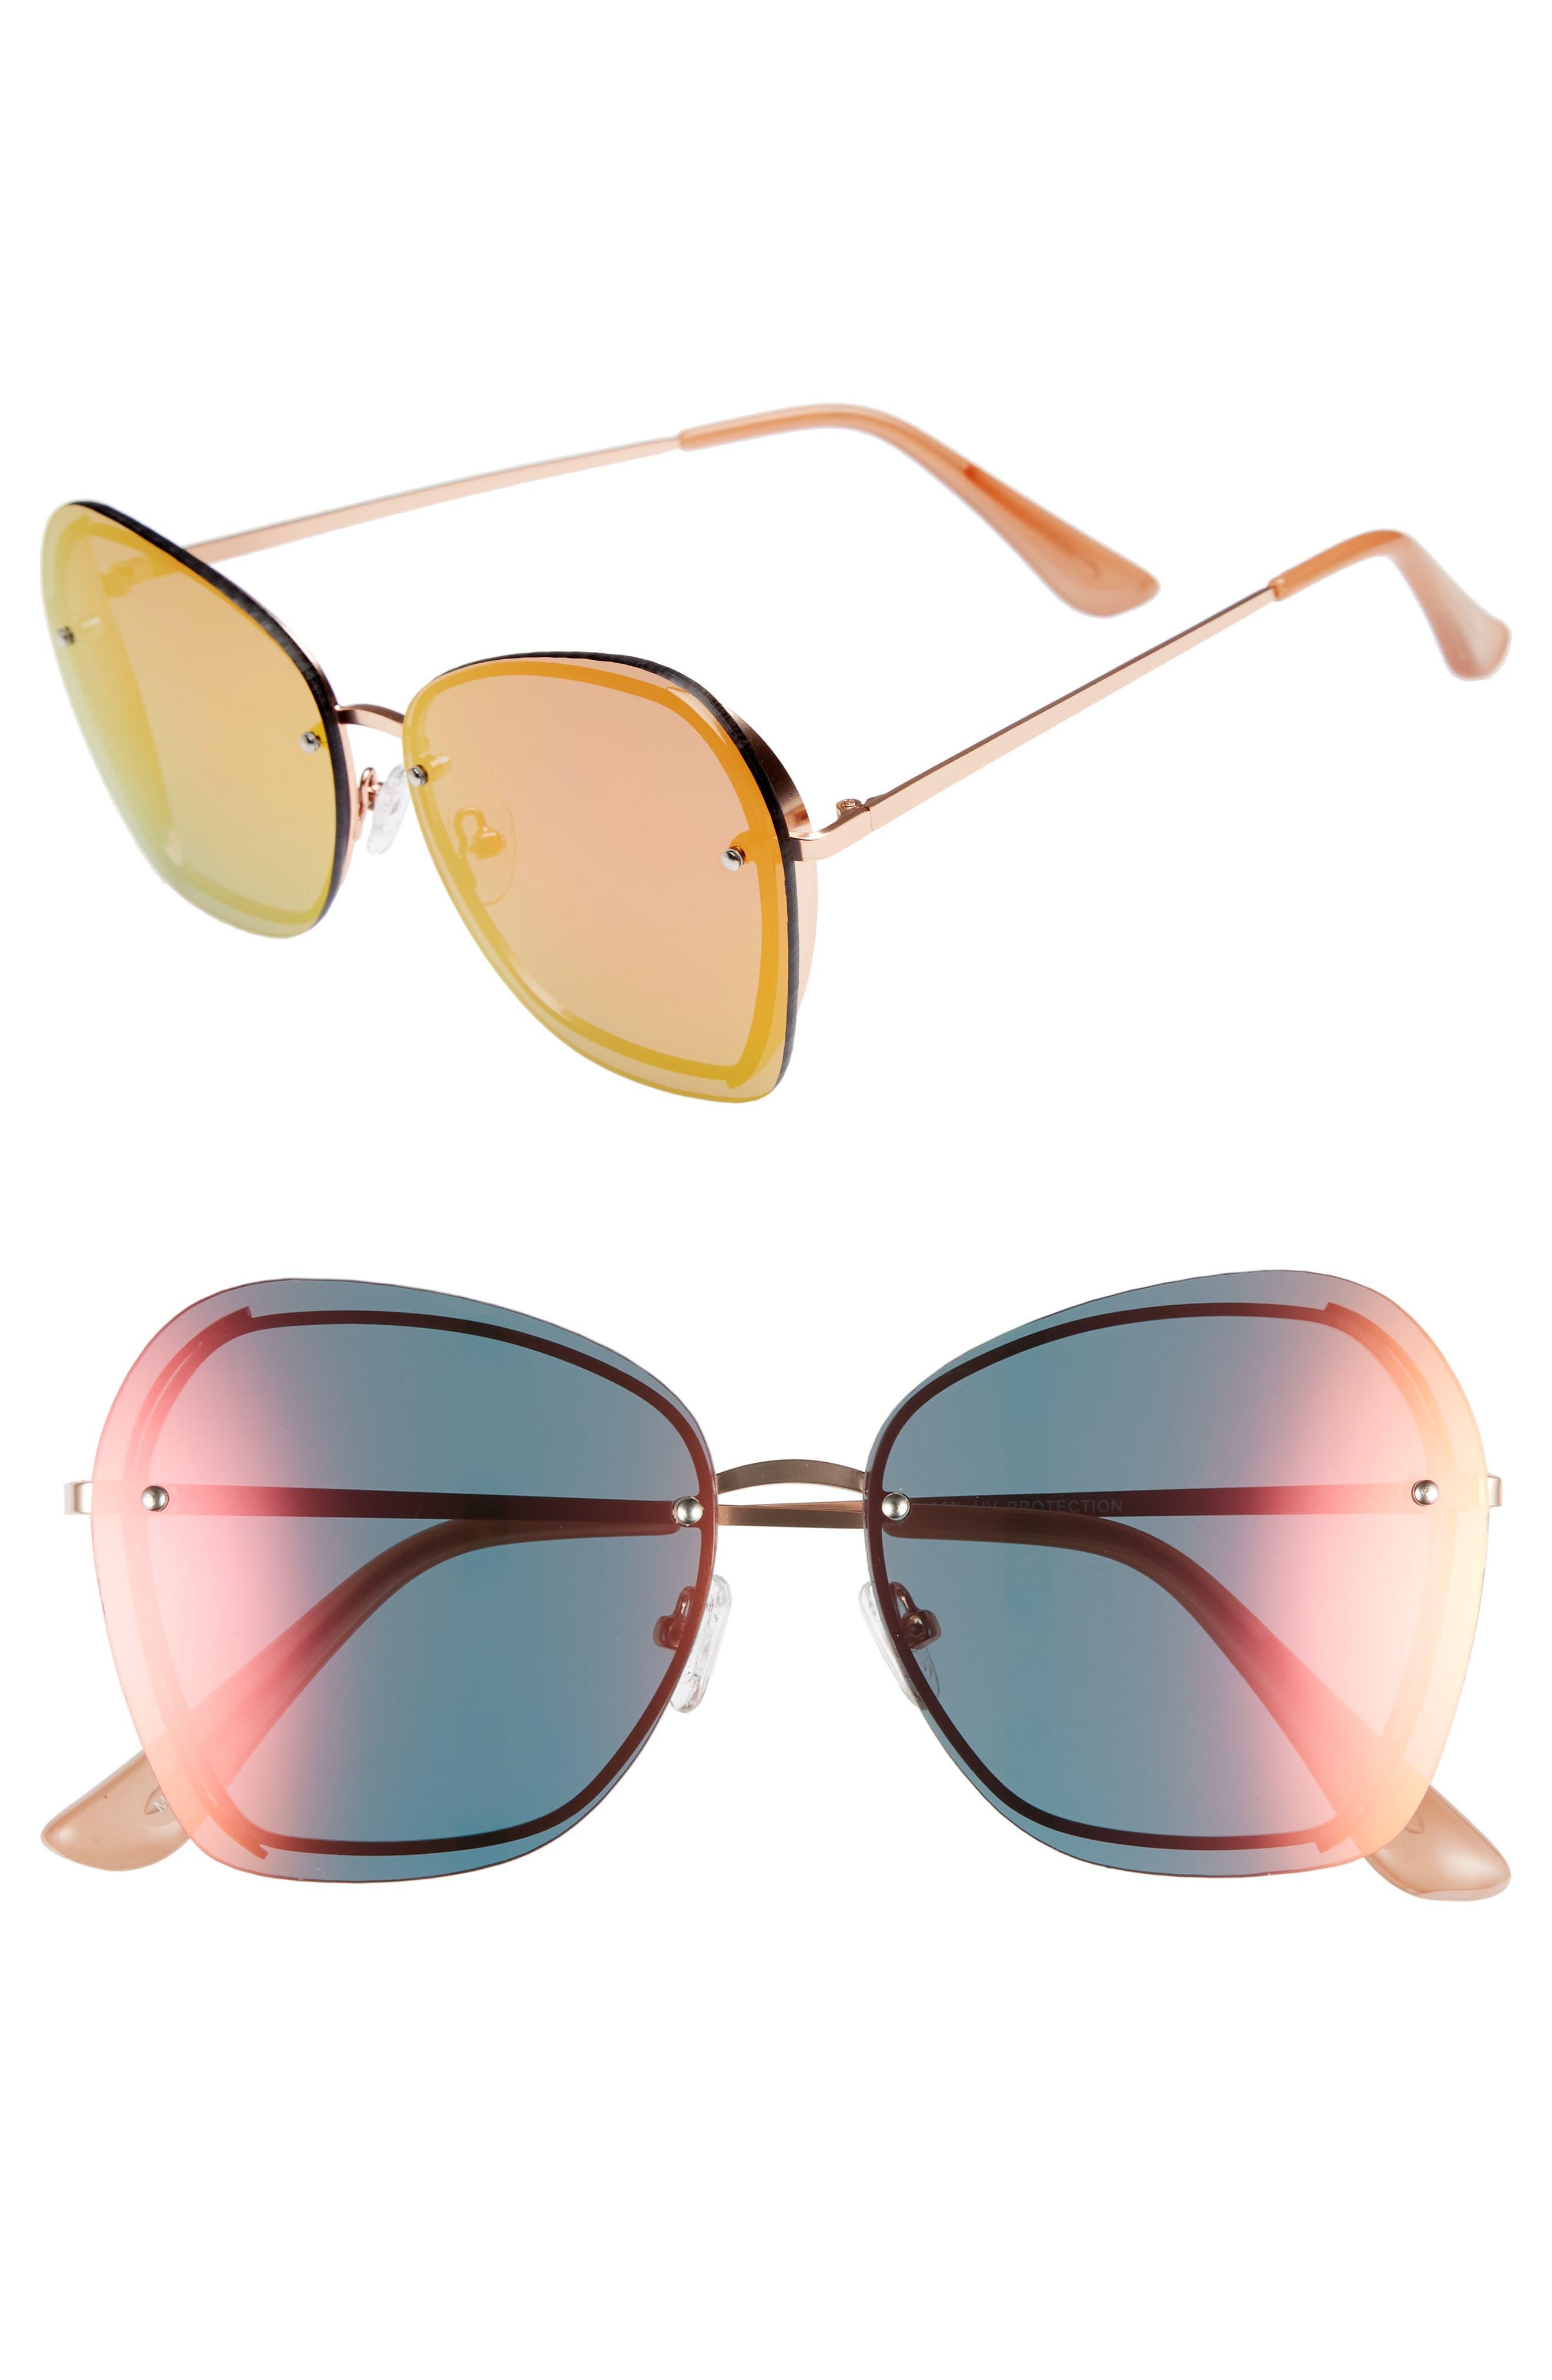 LEITH 61mm Rimless Square Sunglasses, Main, color, 710